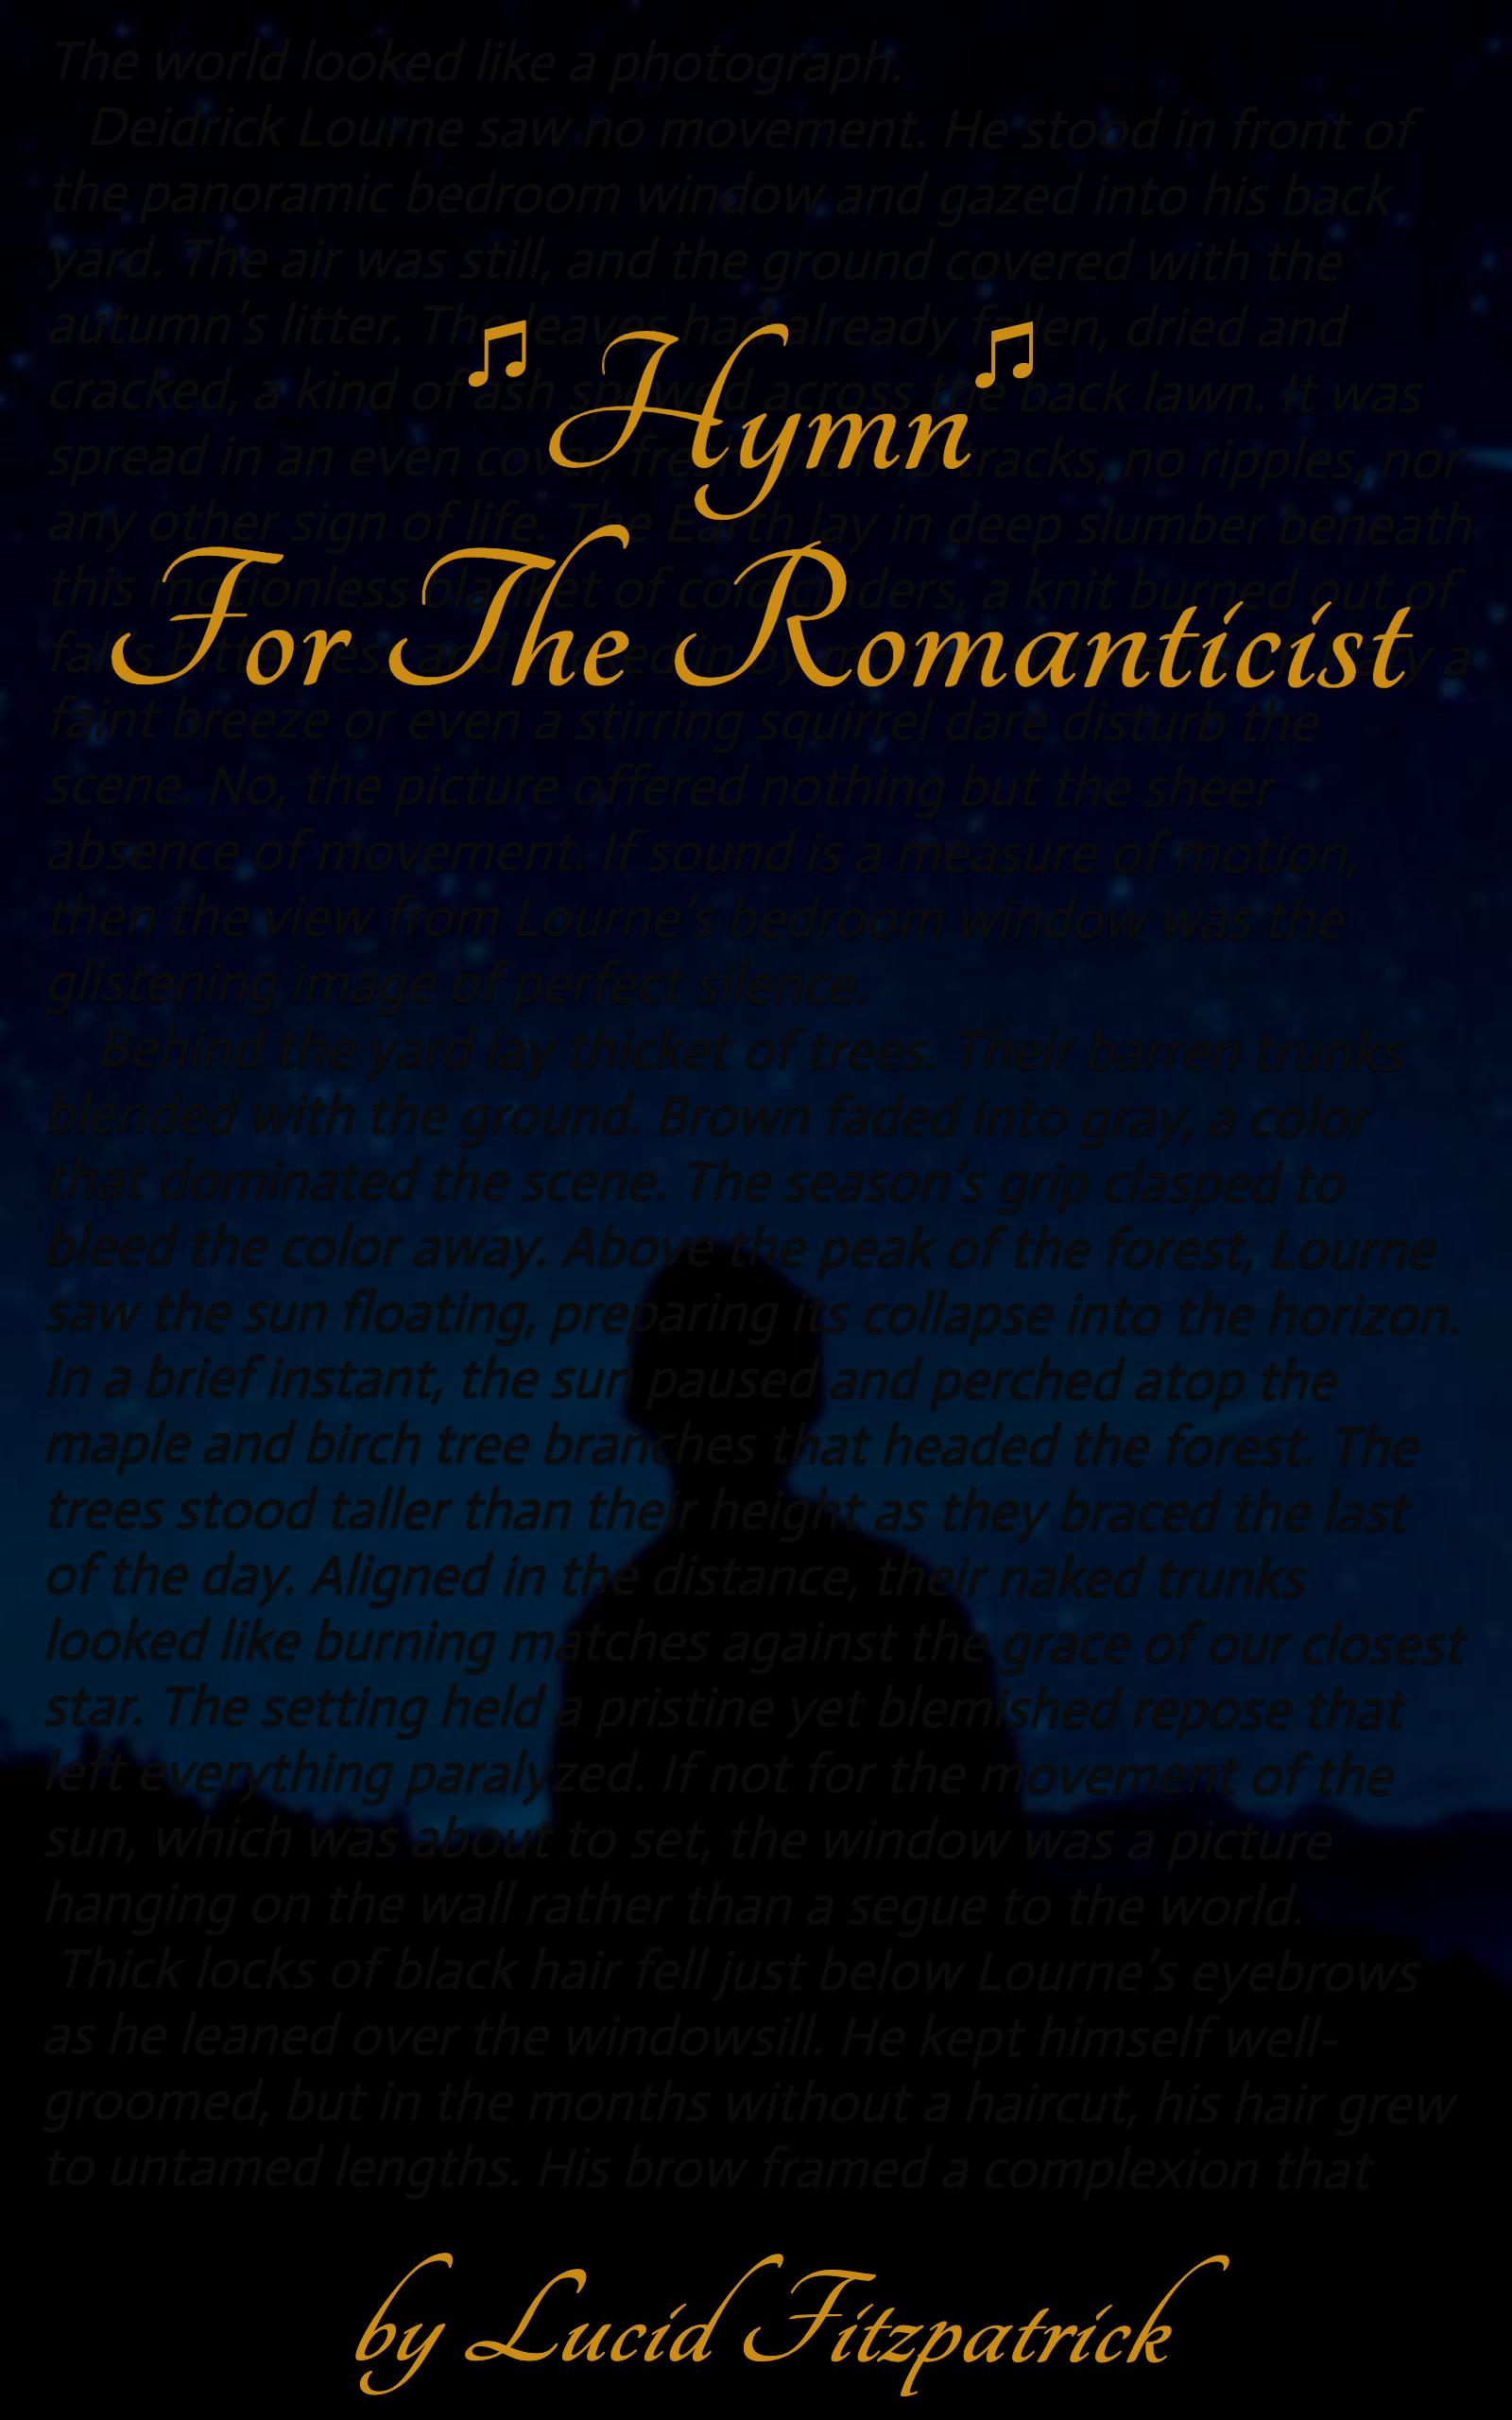 Hymn for the Romanticist